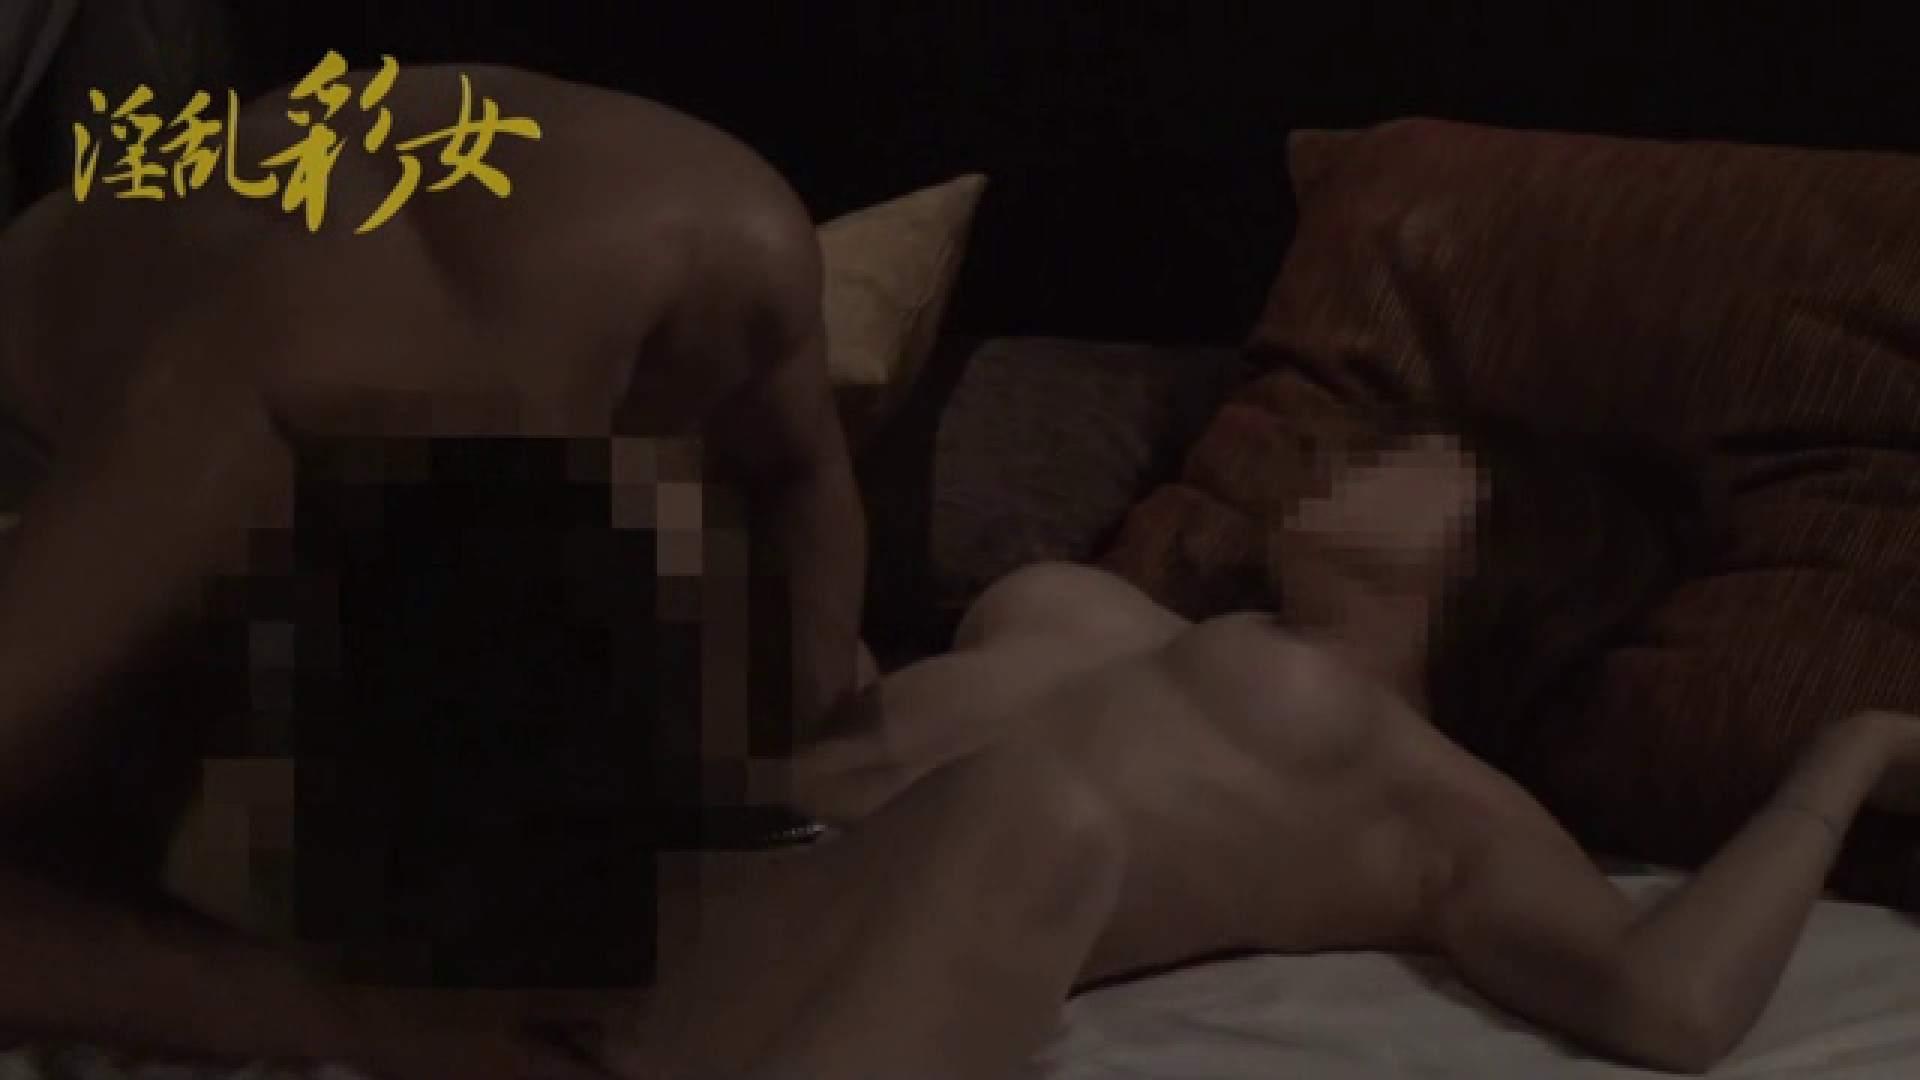 淫乱彩女麻優里 36歳単独さん 他人棒  23連発 9